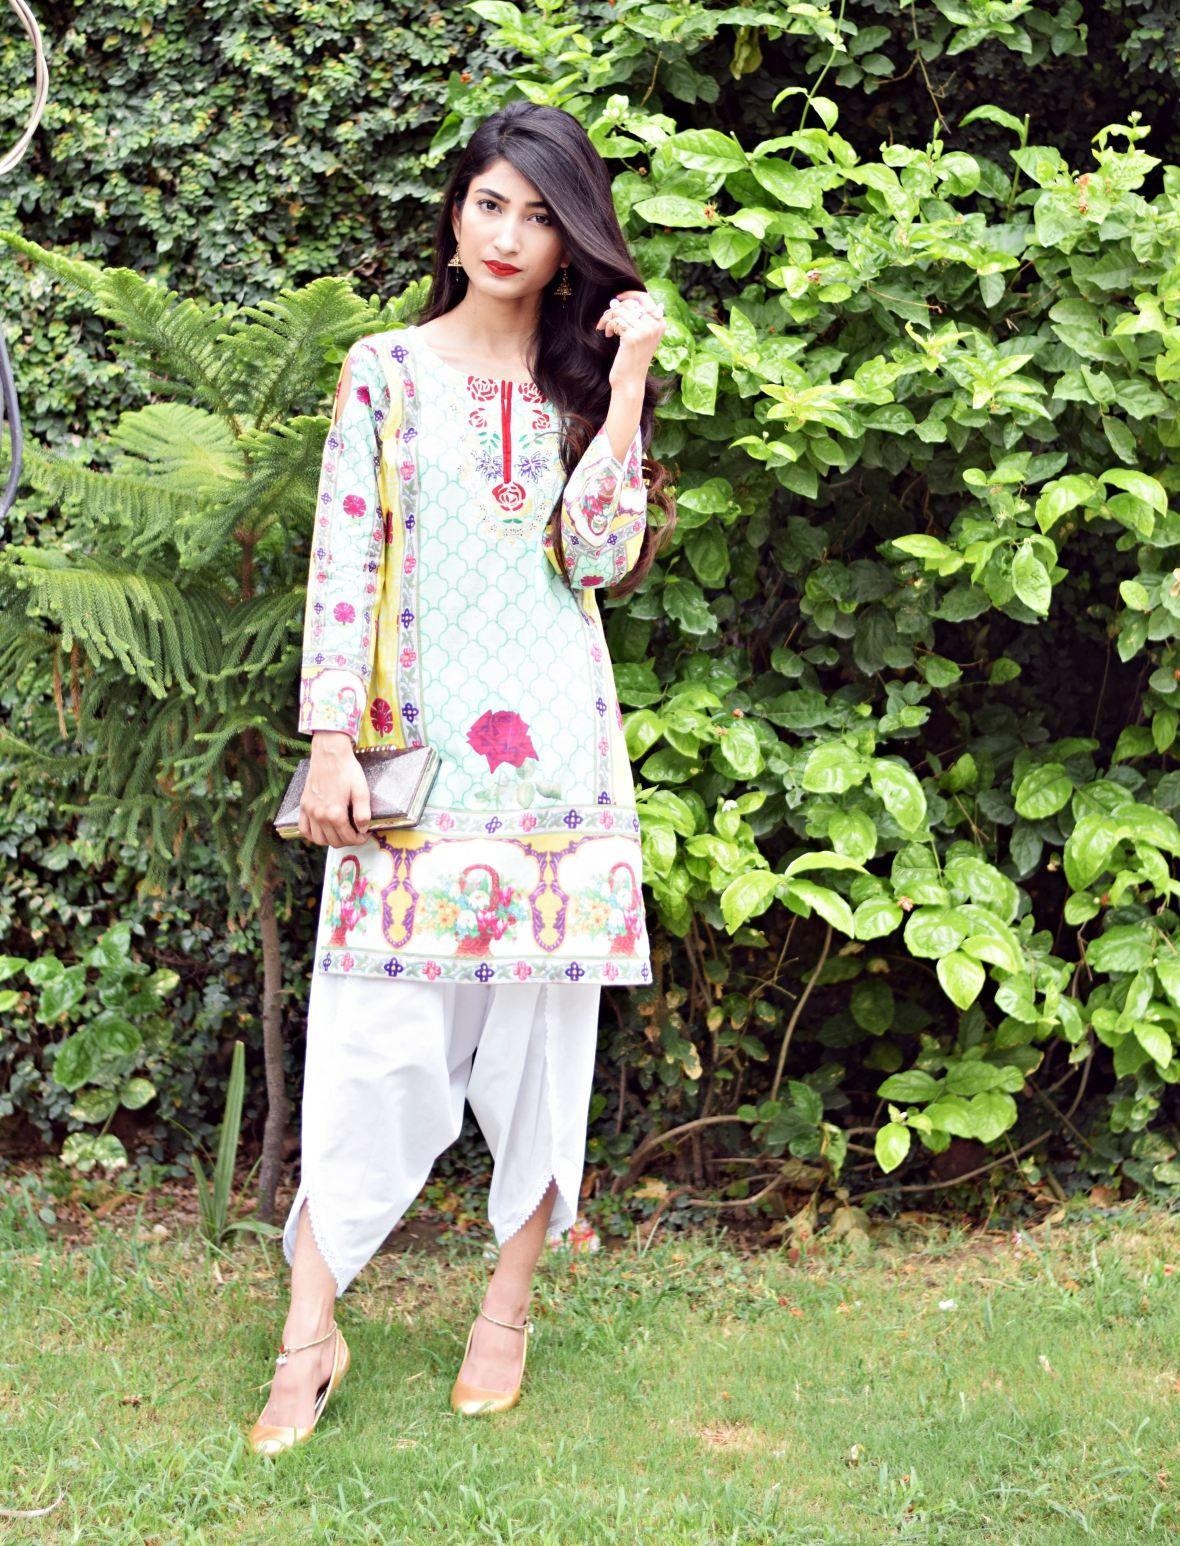 Latest Trend Of Tulip Pants In Pakistan 2017 Designer ...